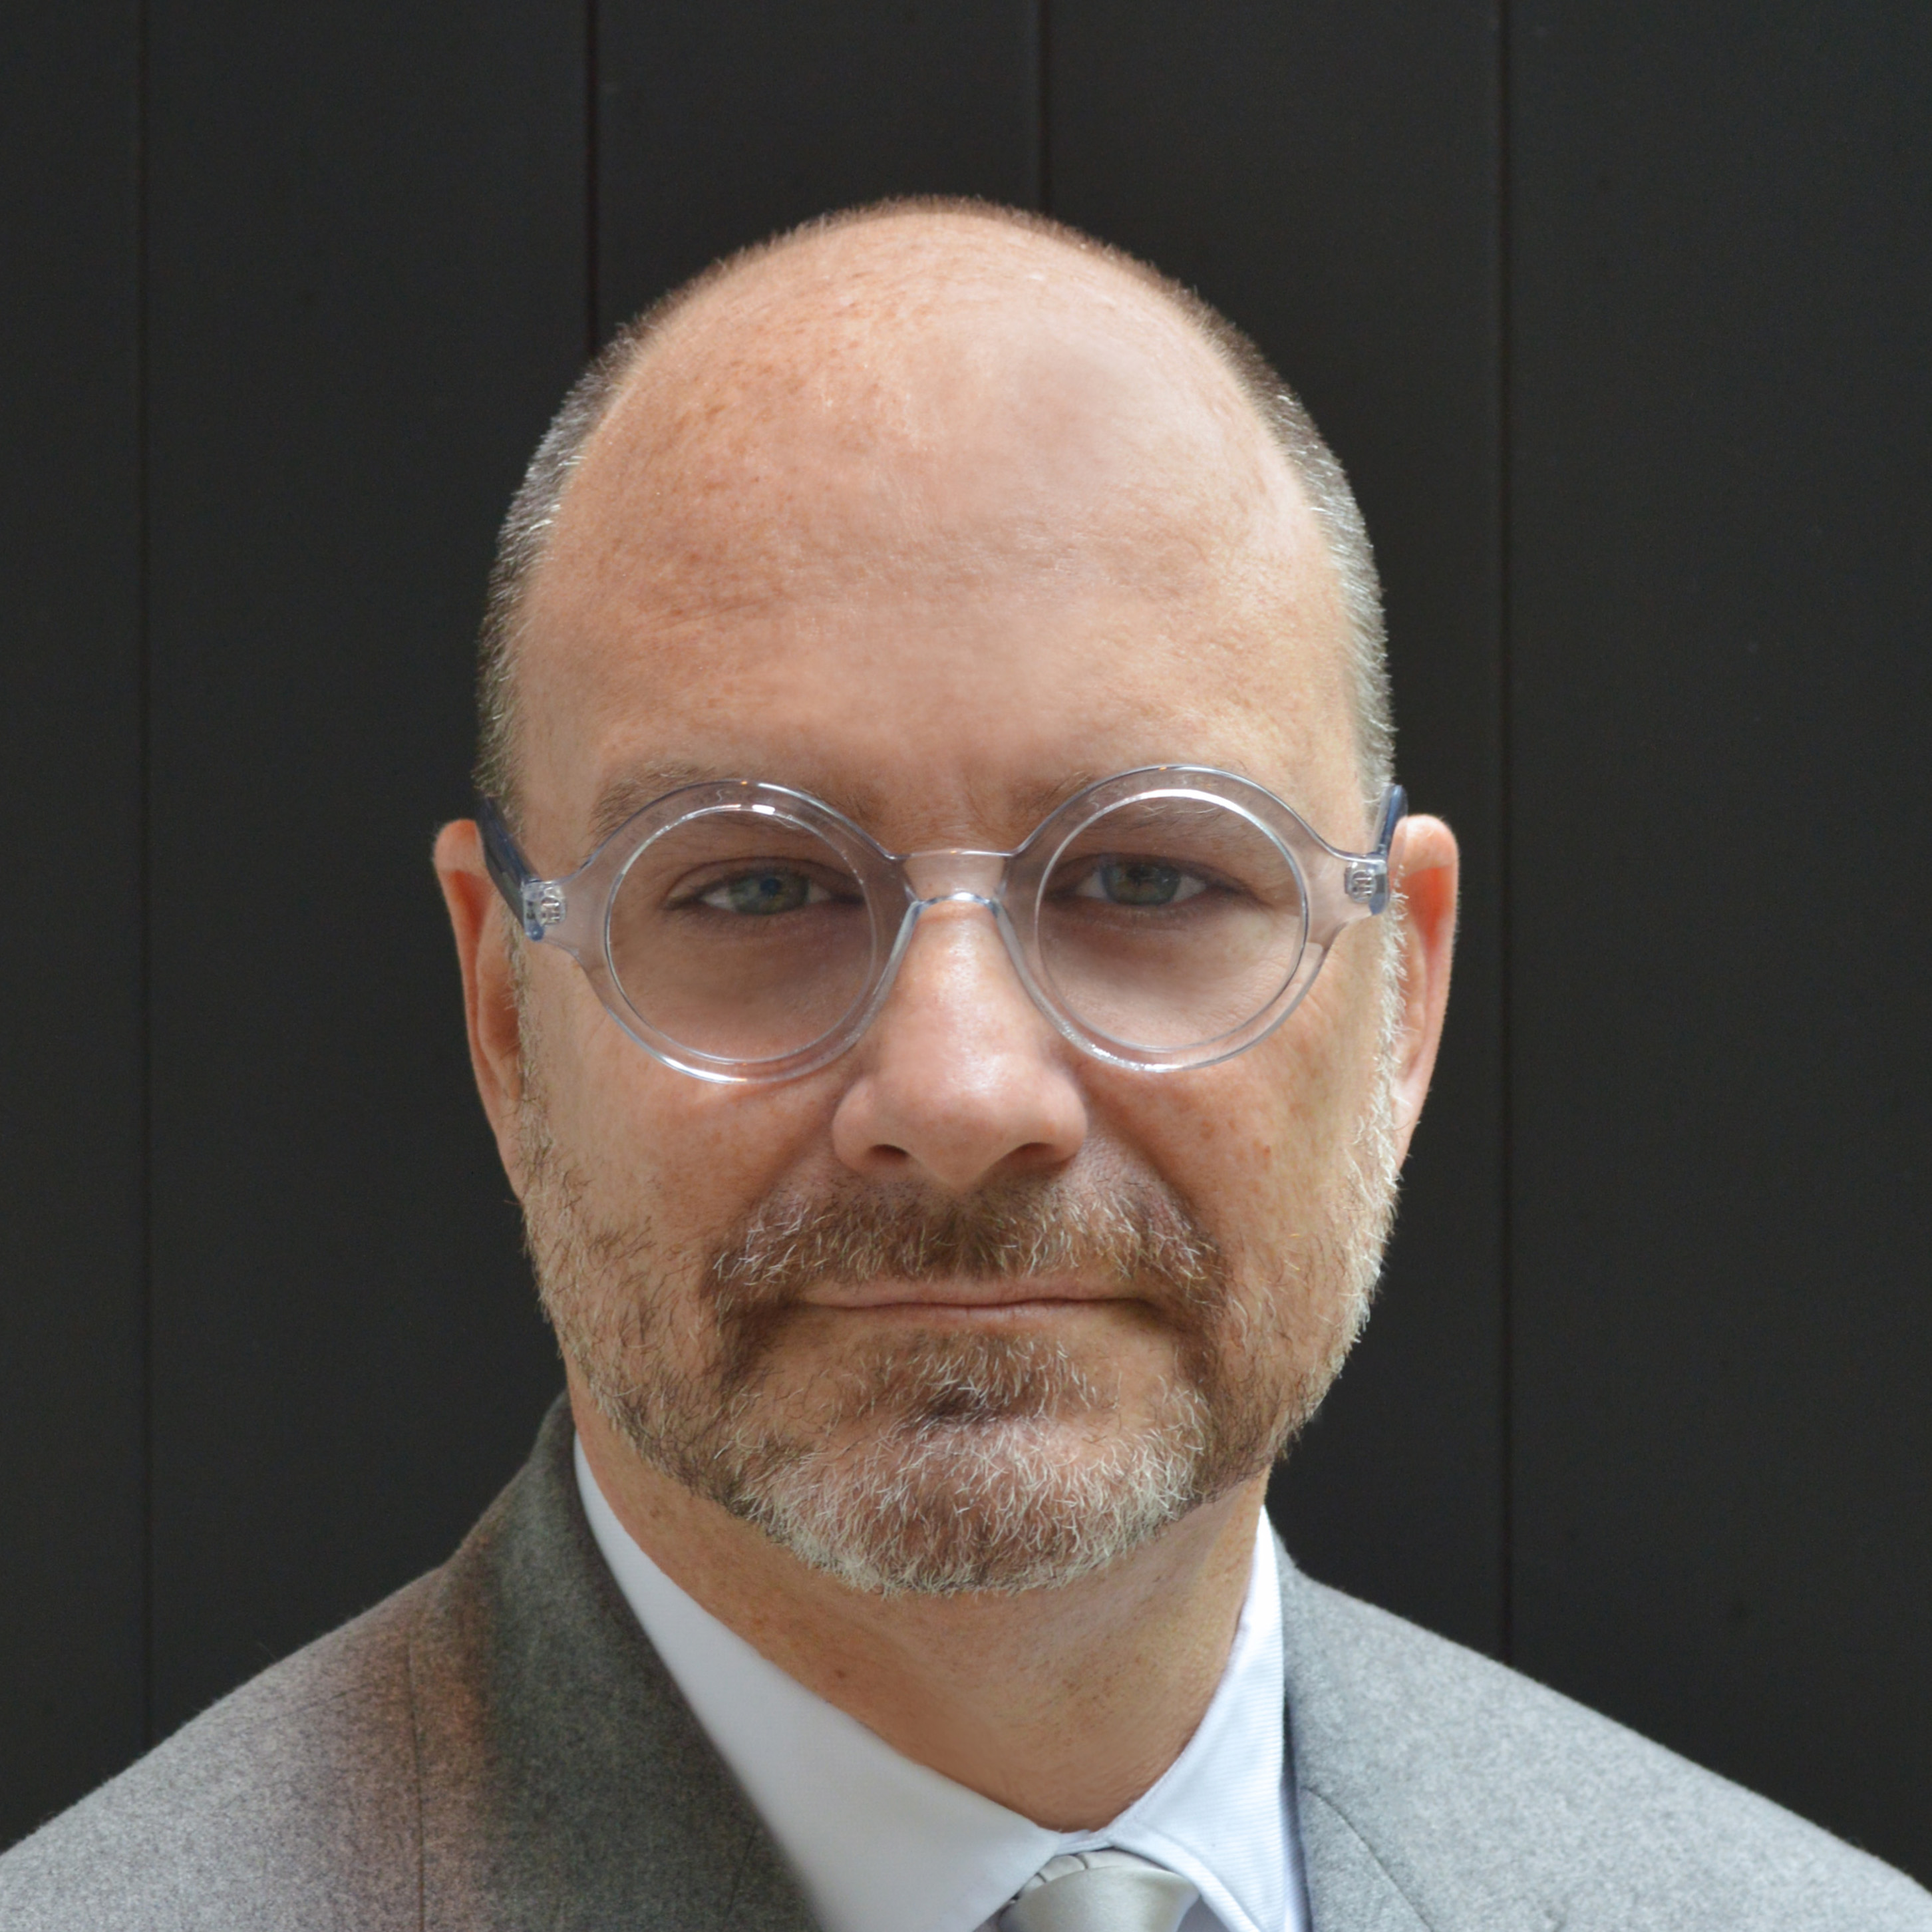 Peter Taub